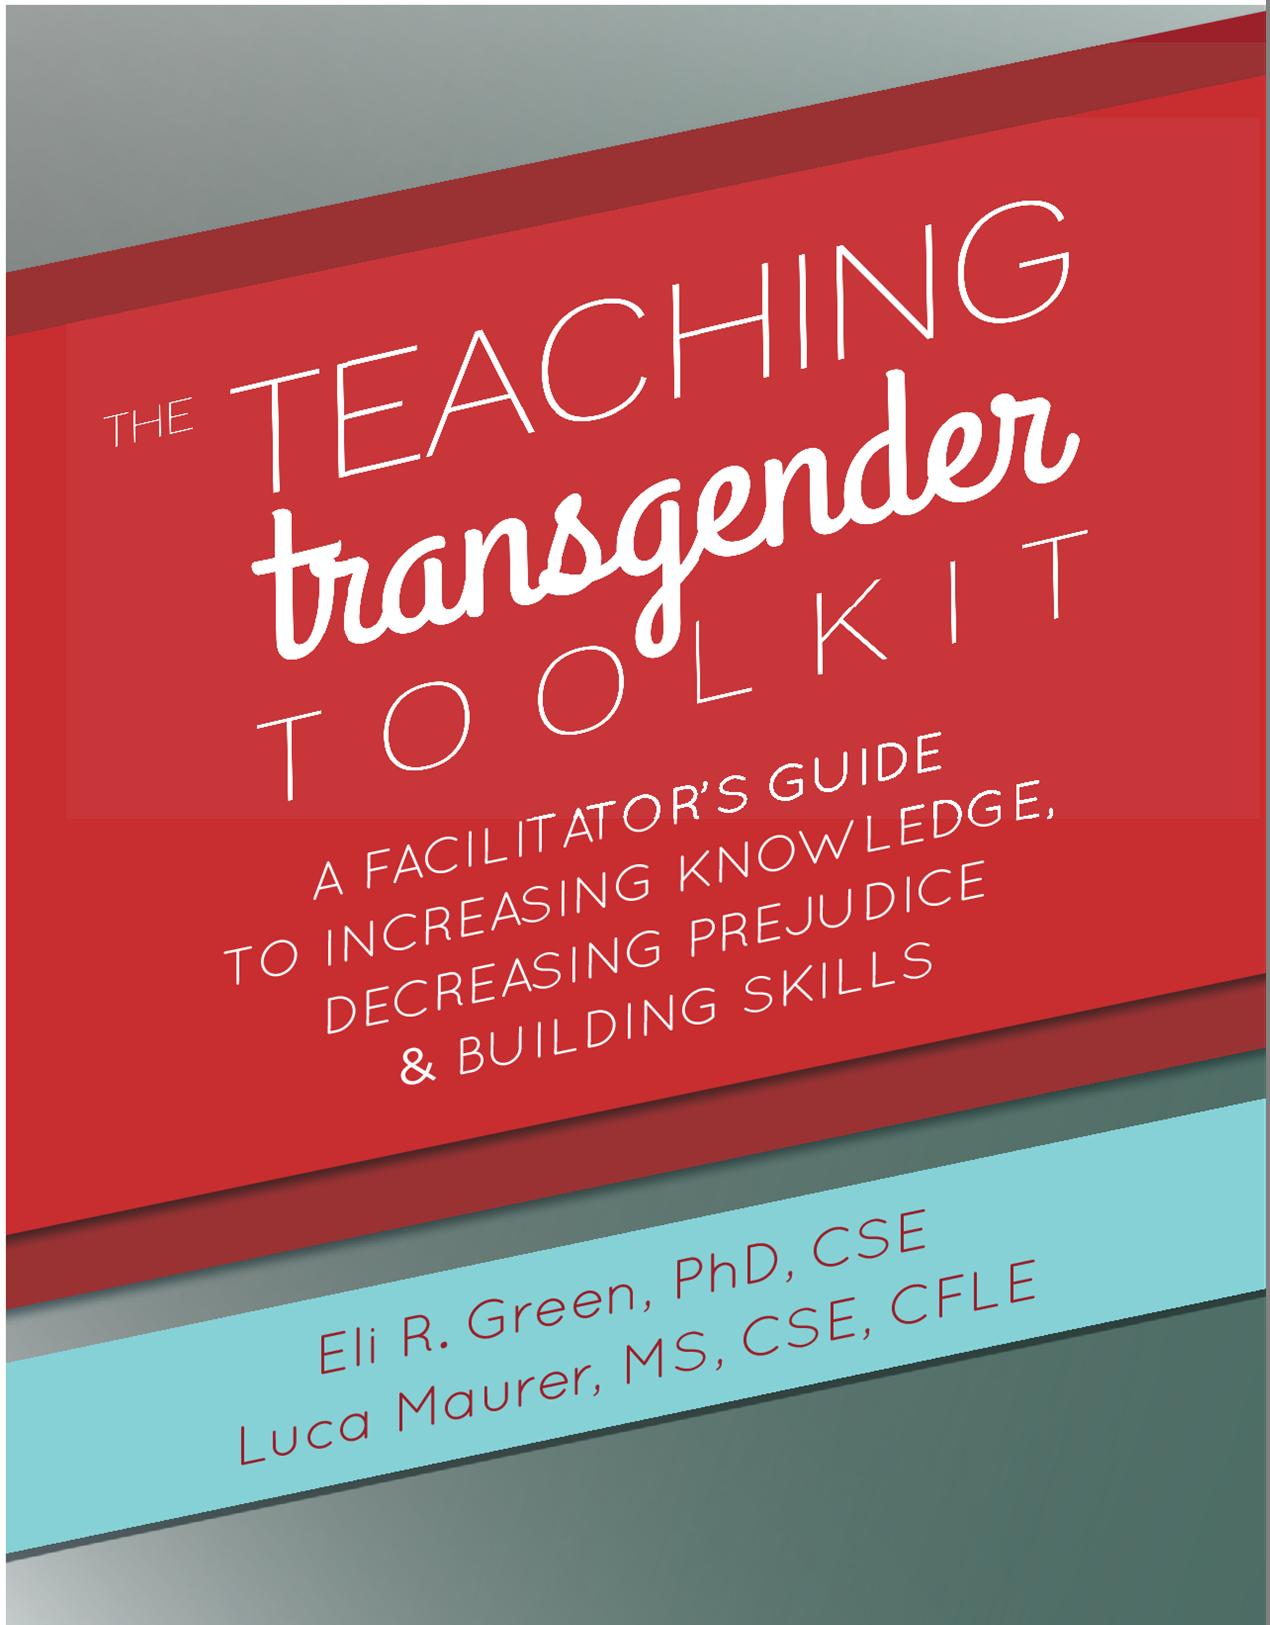 The Teaching Transgender Toolkit